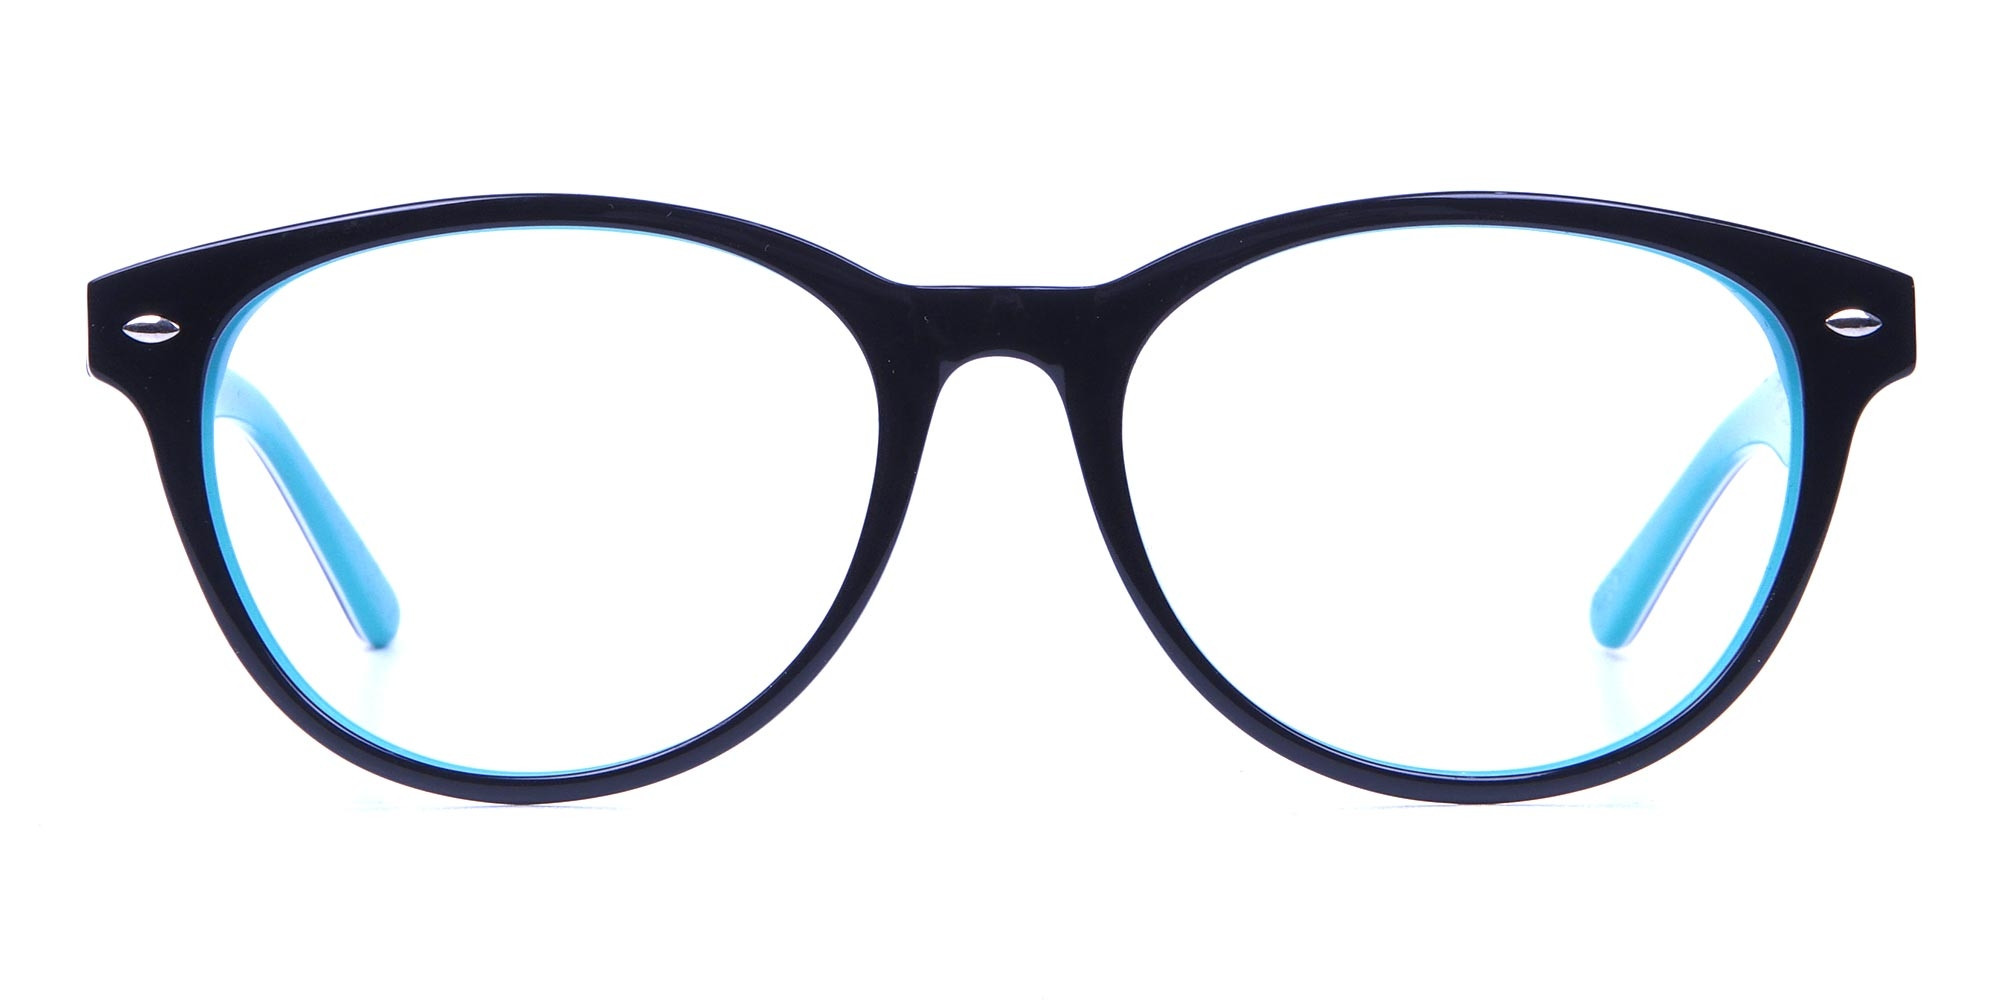 Black & Mint Round Glasses, Eyeglasses